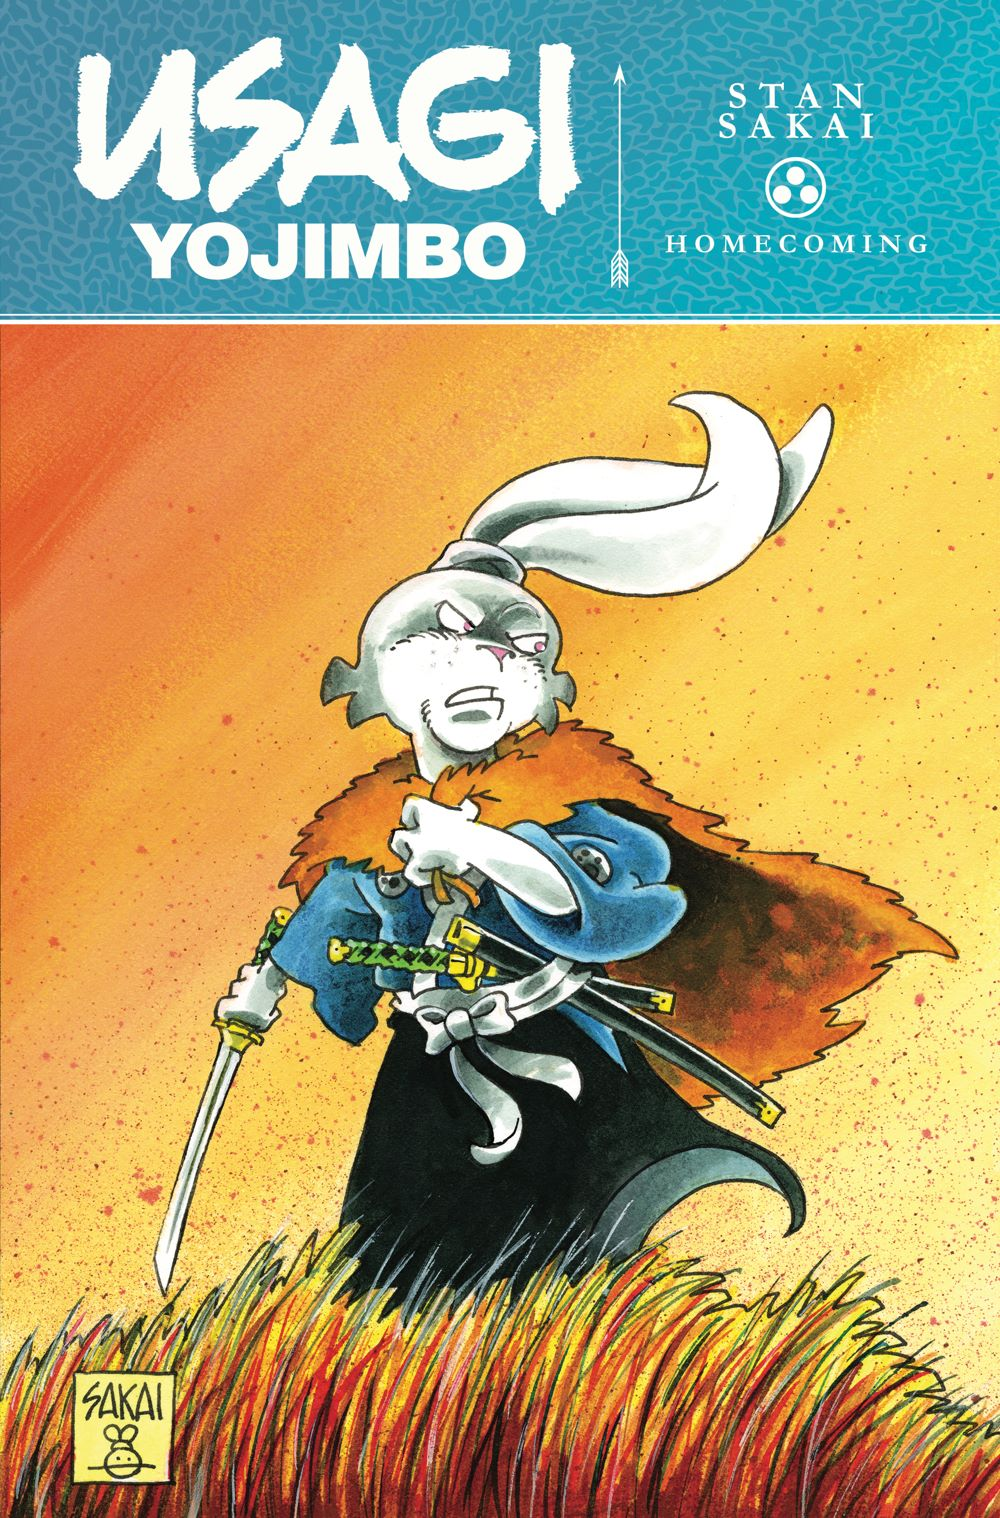 Usagi-v02_cvr ComicList Previews: USAGI YOJIMBO VOLUME 2 HOMECOMING TP